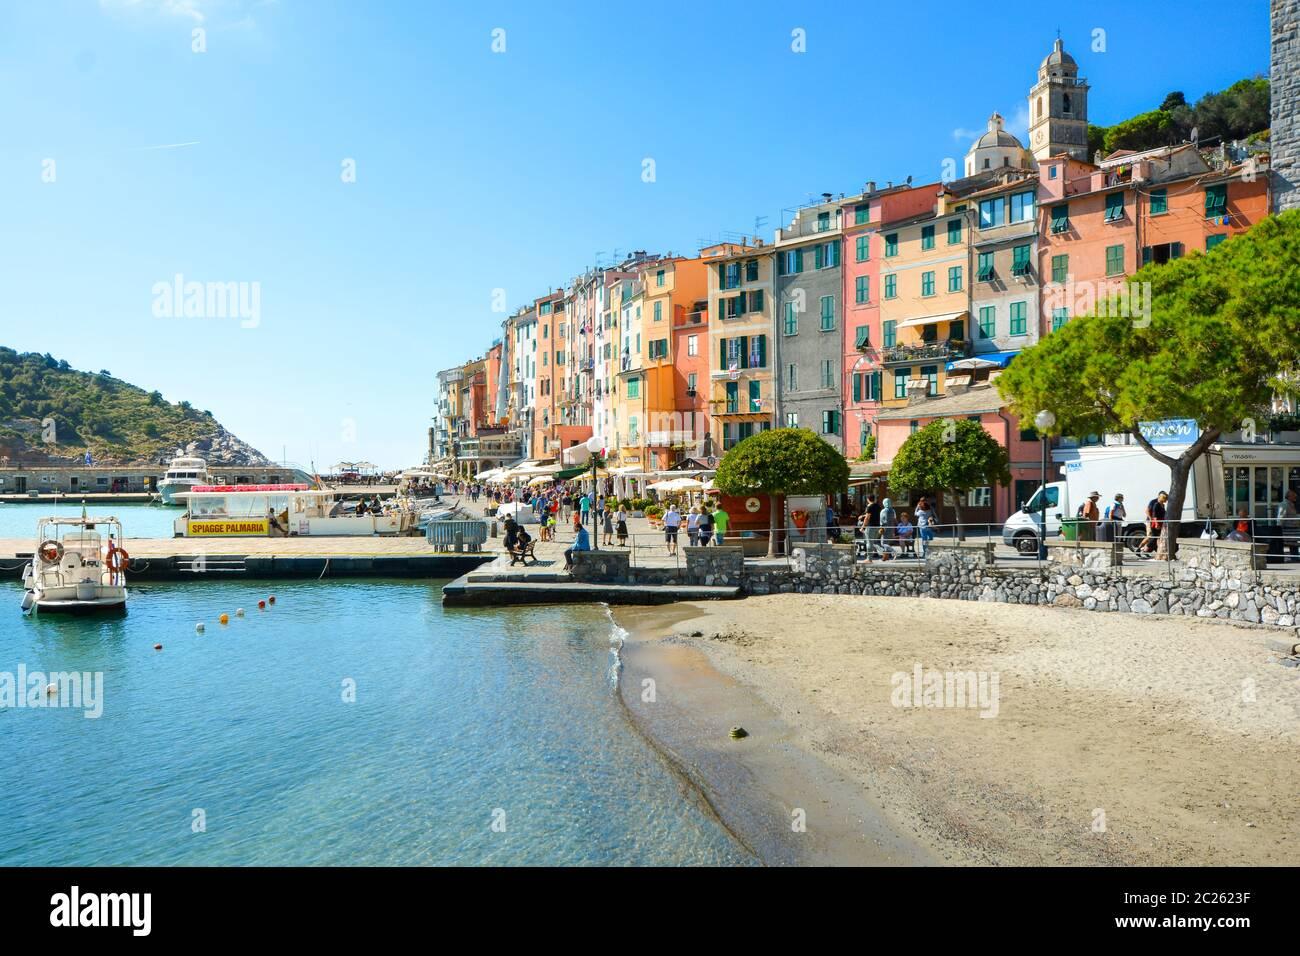 The colorful town, sea, Gulf of Poets and sandy beach at Porto Venere Italy in La Spezia Italy. Stock Photo